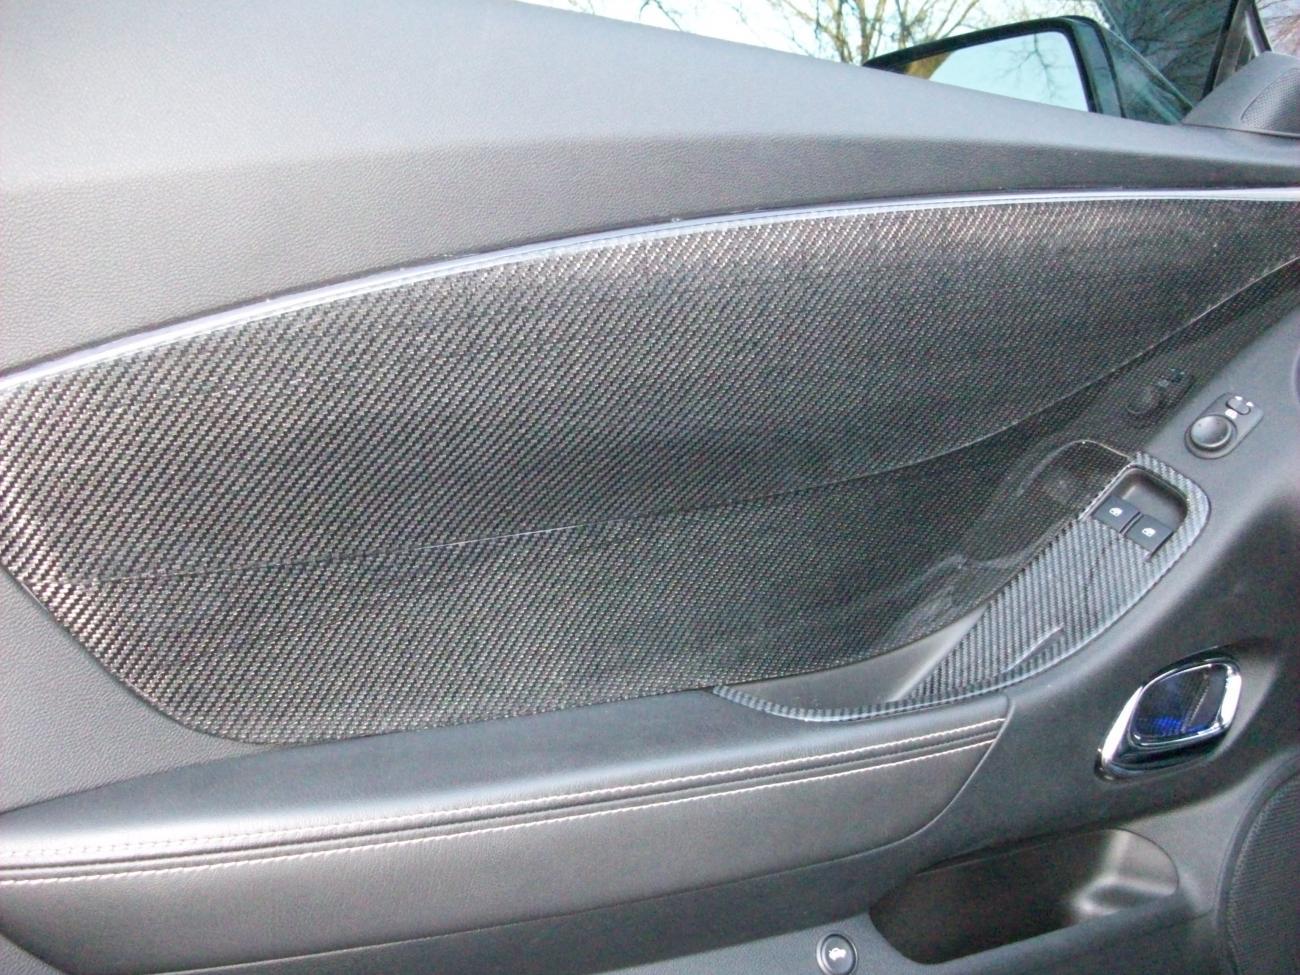 Carid Carbon Fiber Interior Trim Kit Page 4 Camaro5 Chevy Camaro Forum Camaro Zl1 Ss And